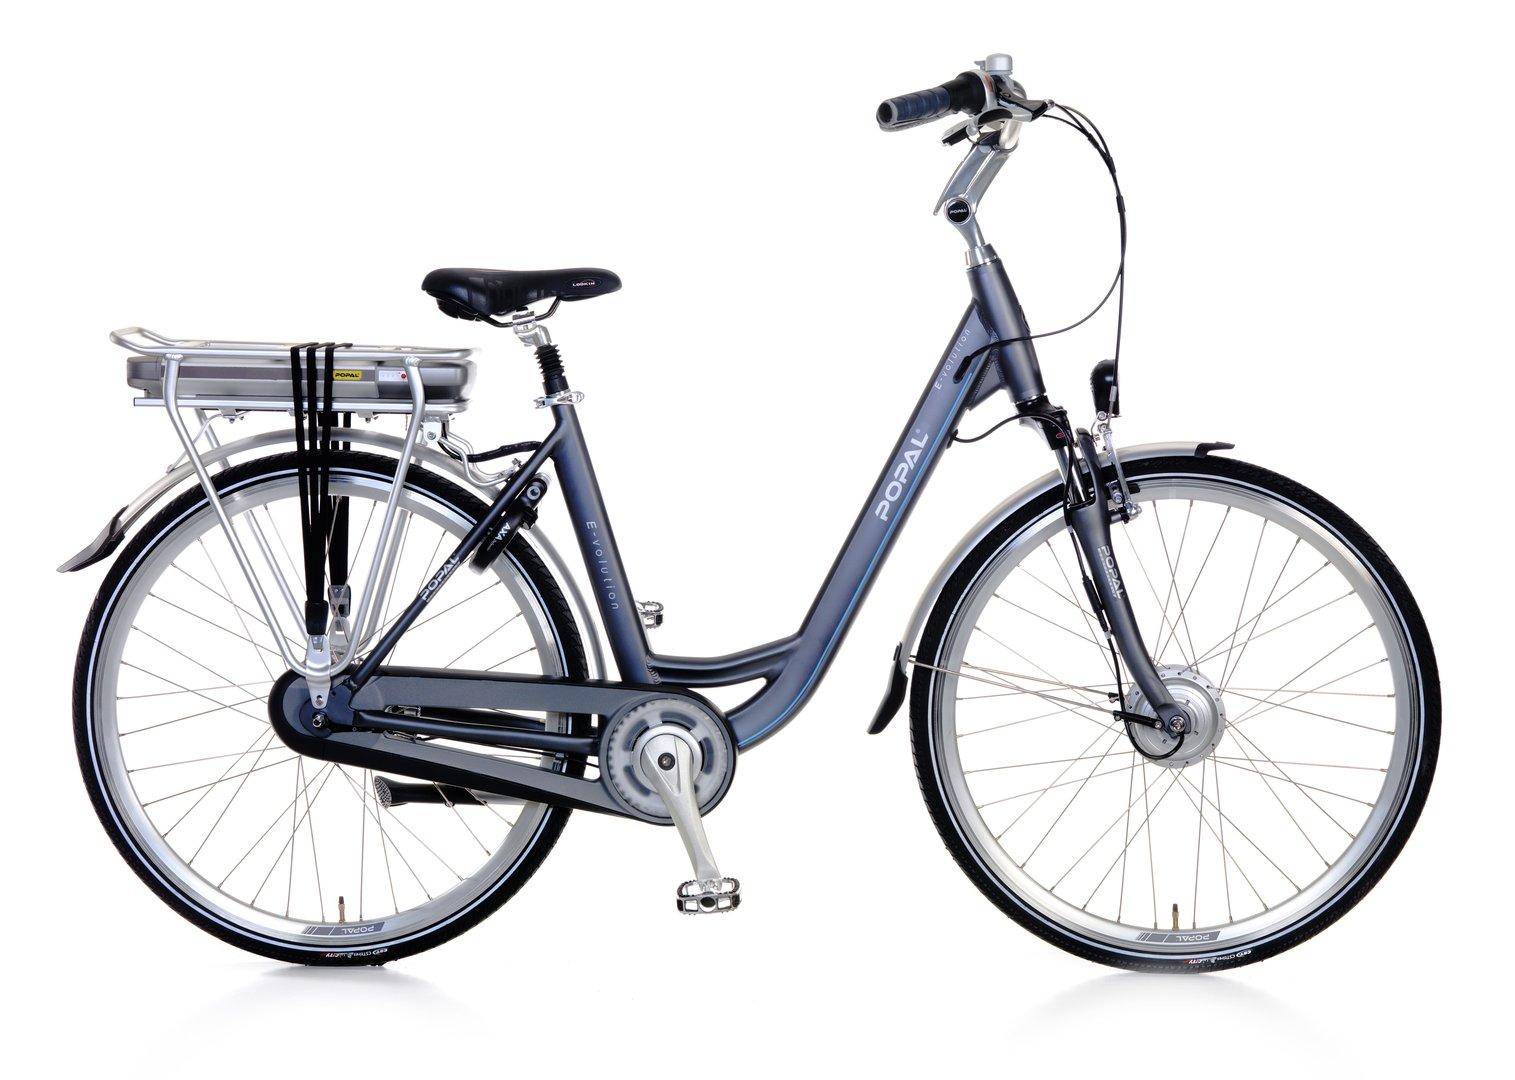 e volution 3 0 8 gang shimano nexus pedelec e bike. Black Bedroom Furniture Sets. Home Design Ideas